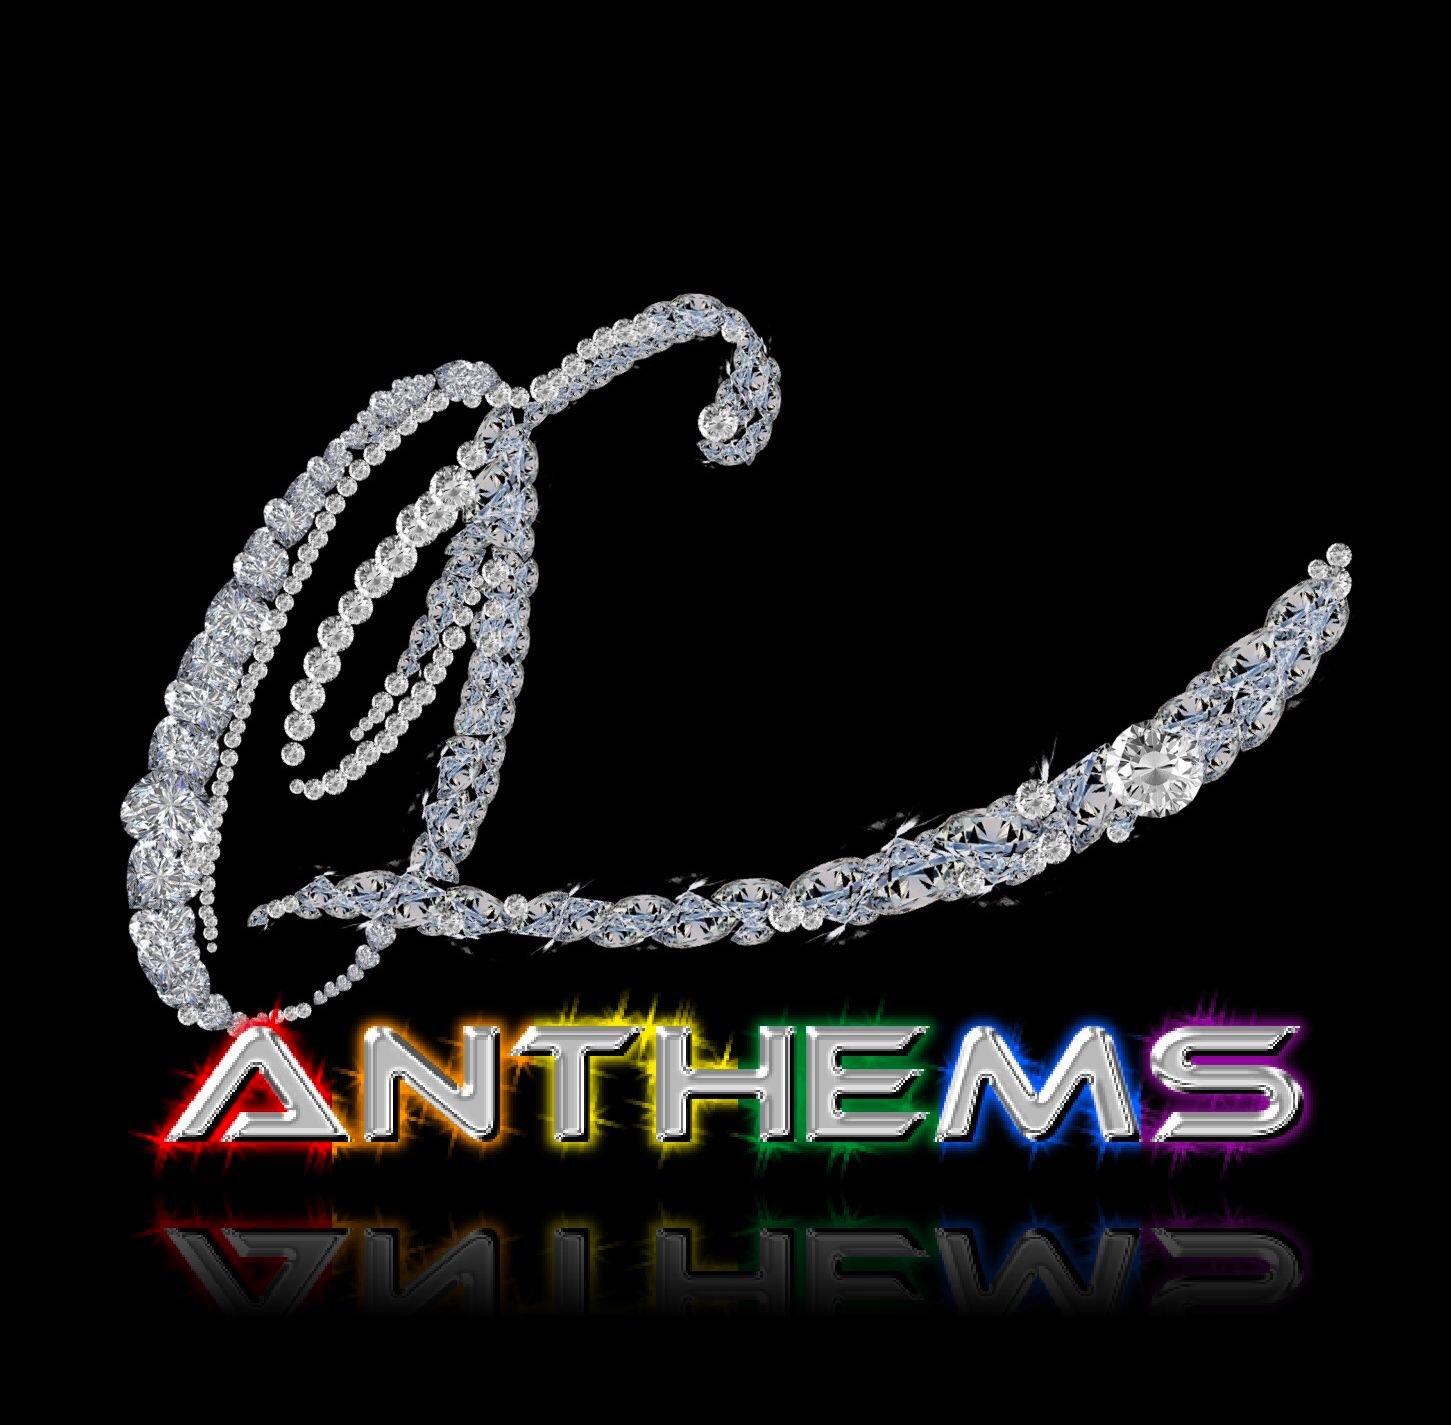 Q Anthems - Volume 1 Dougmc Podcasts podcast